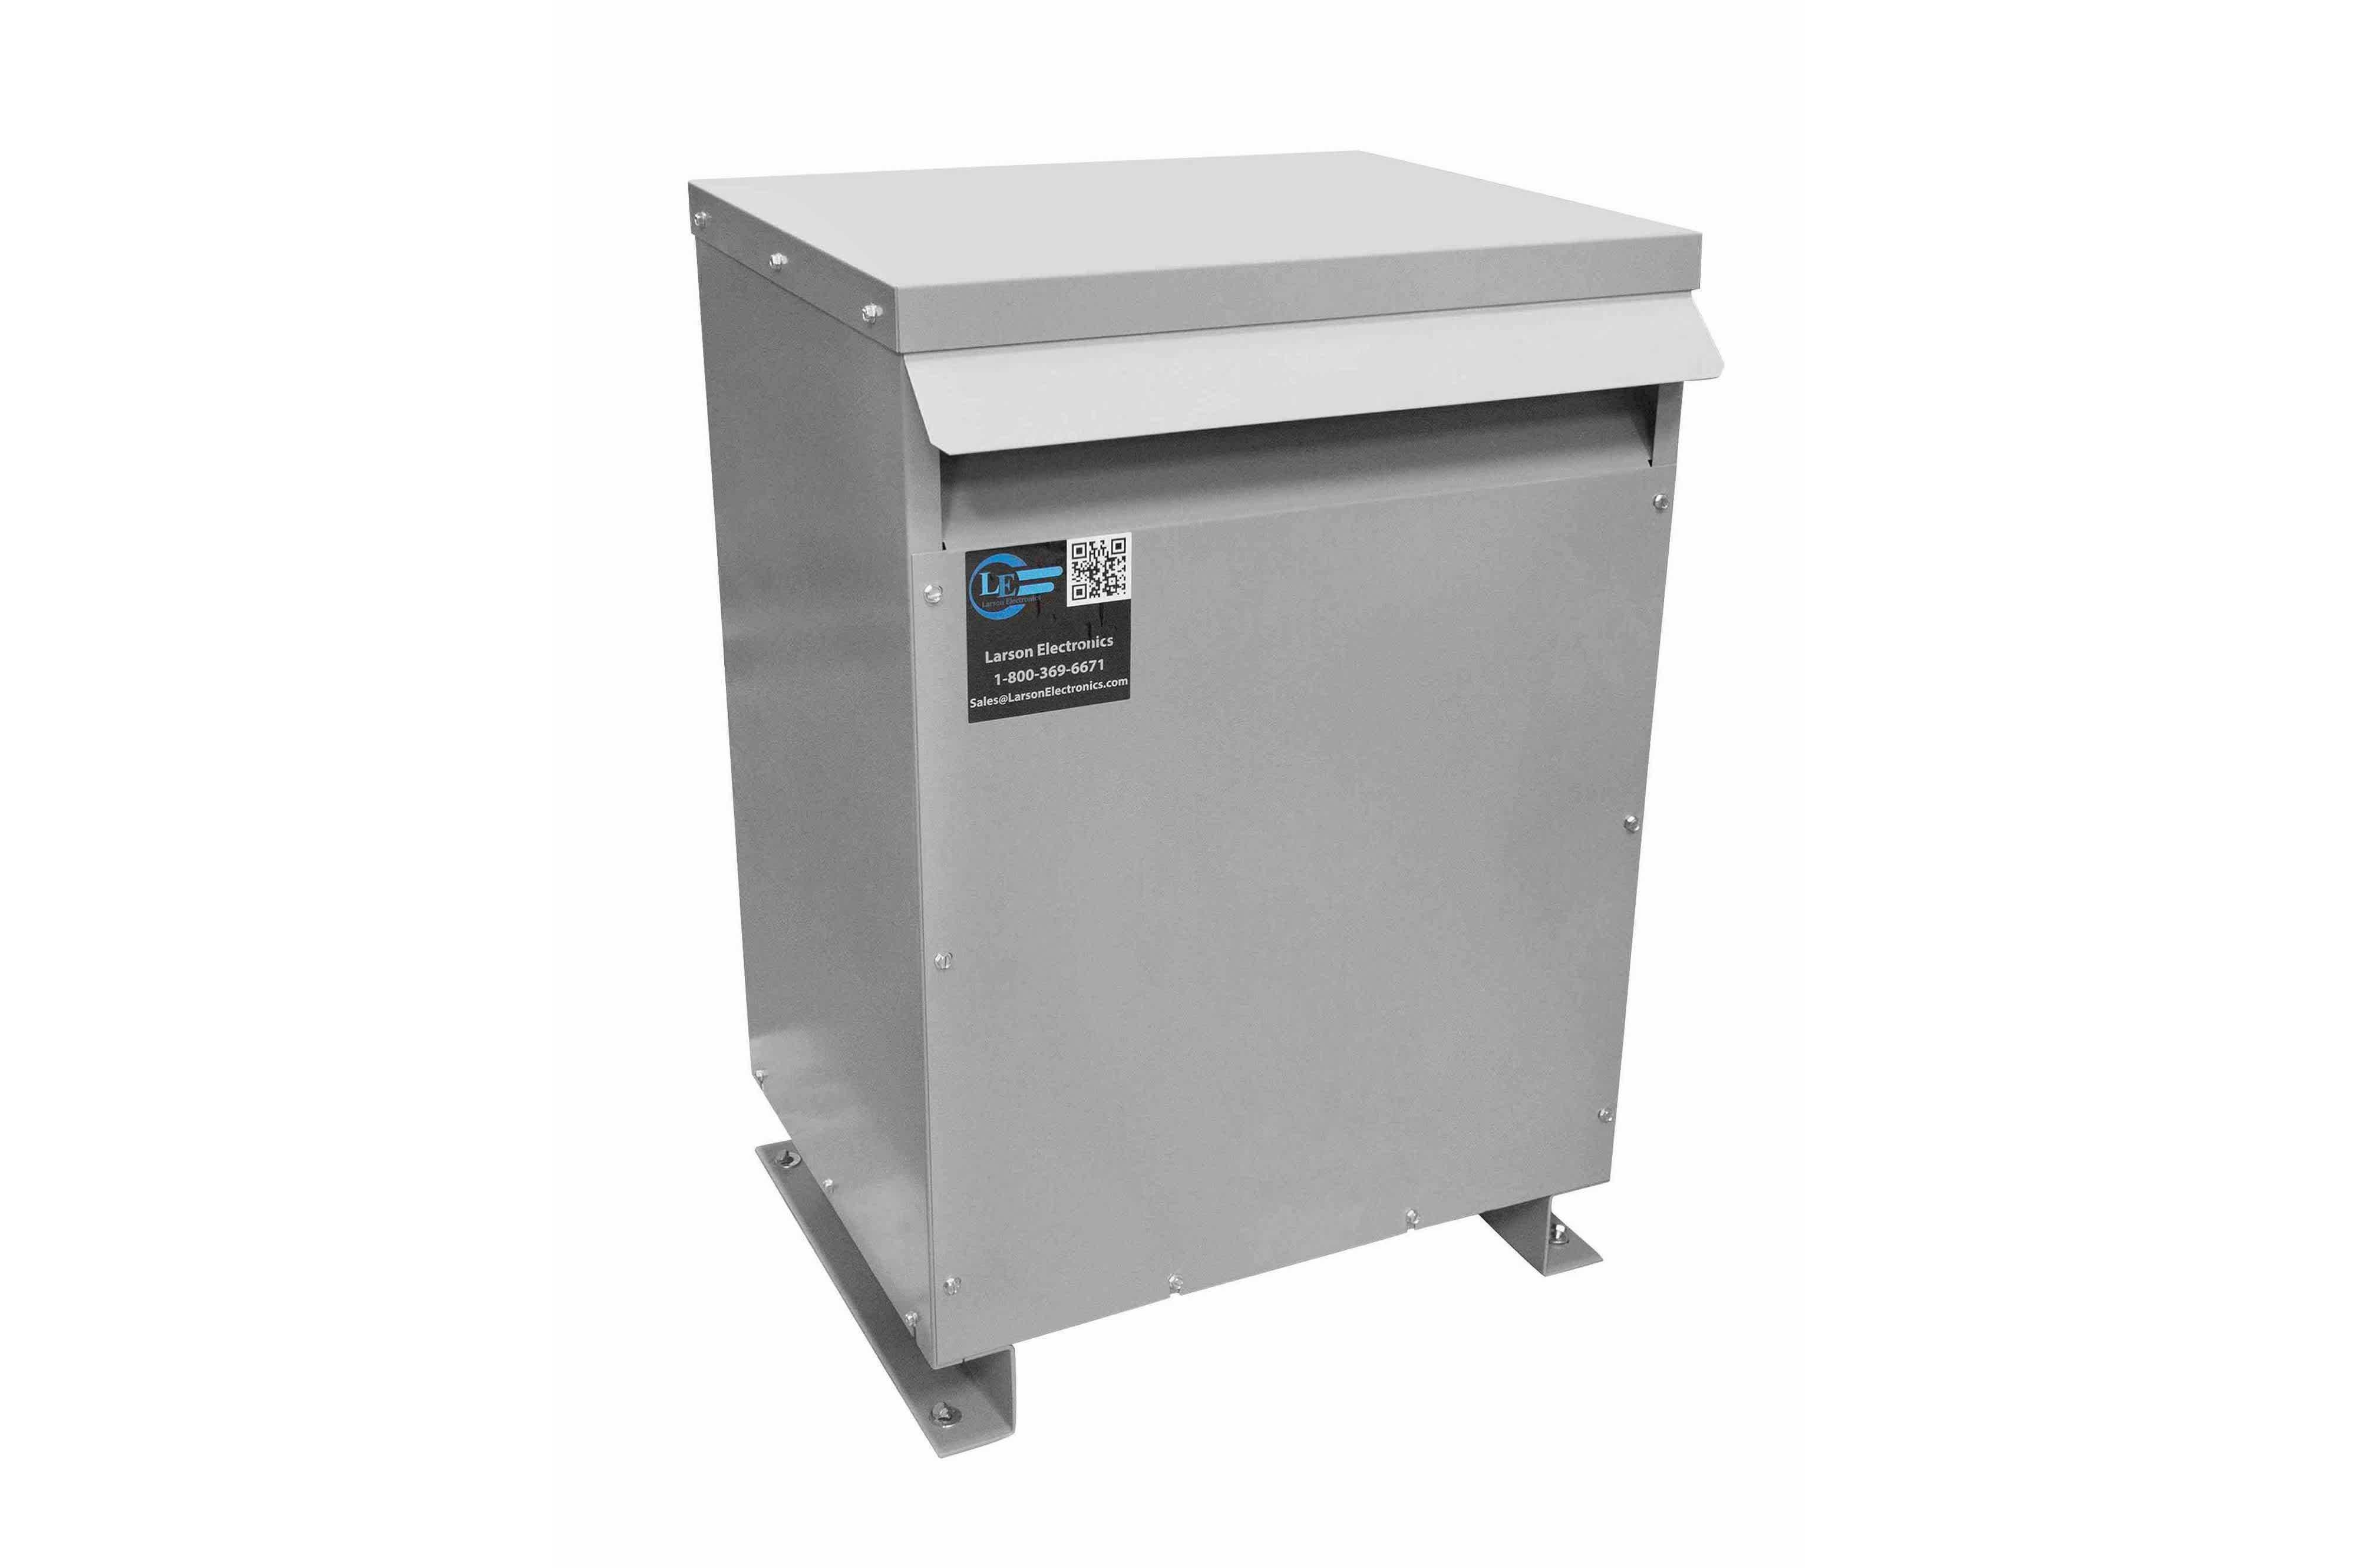 65 kVA 3PH Isolation Transformer, 220V Wye Primary, 480Y/277 Wye-N Secondary, N3R, Ventilated, 60 Hz